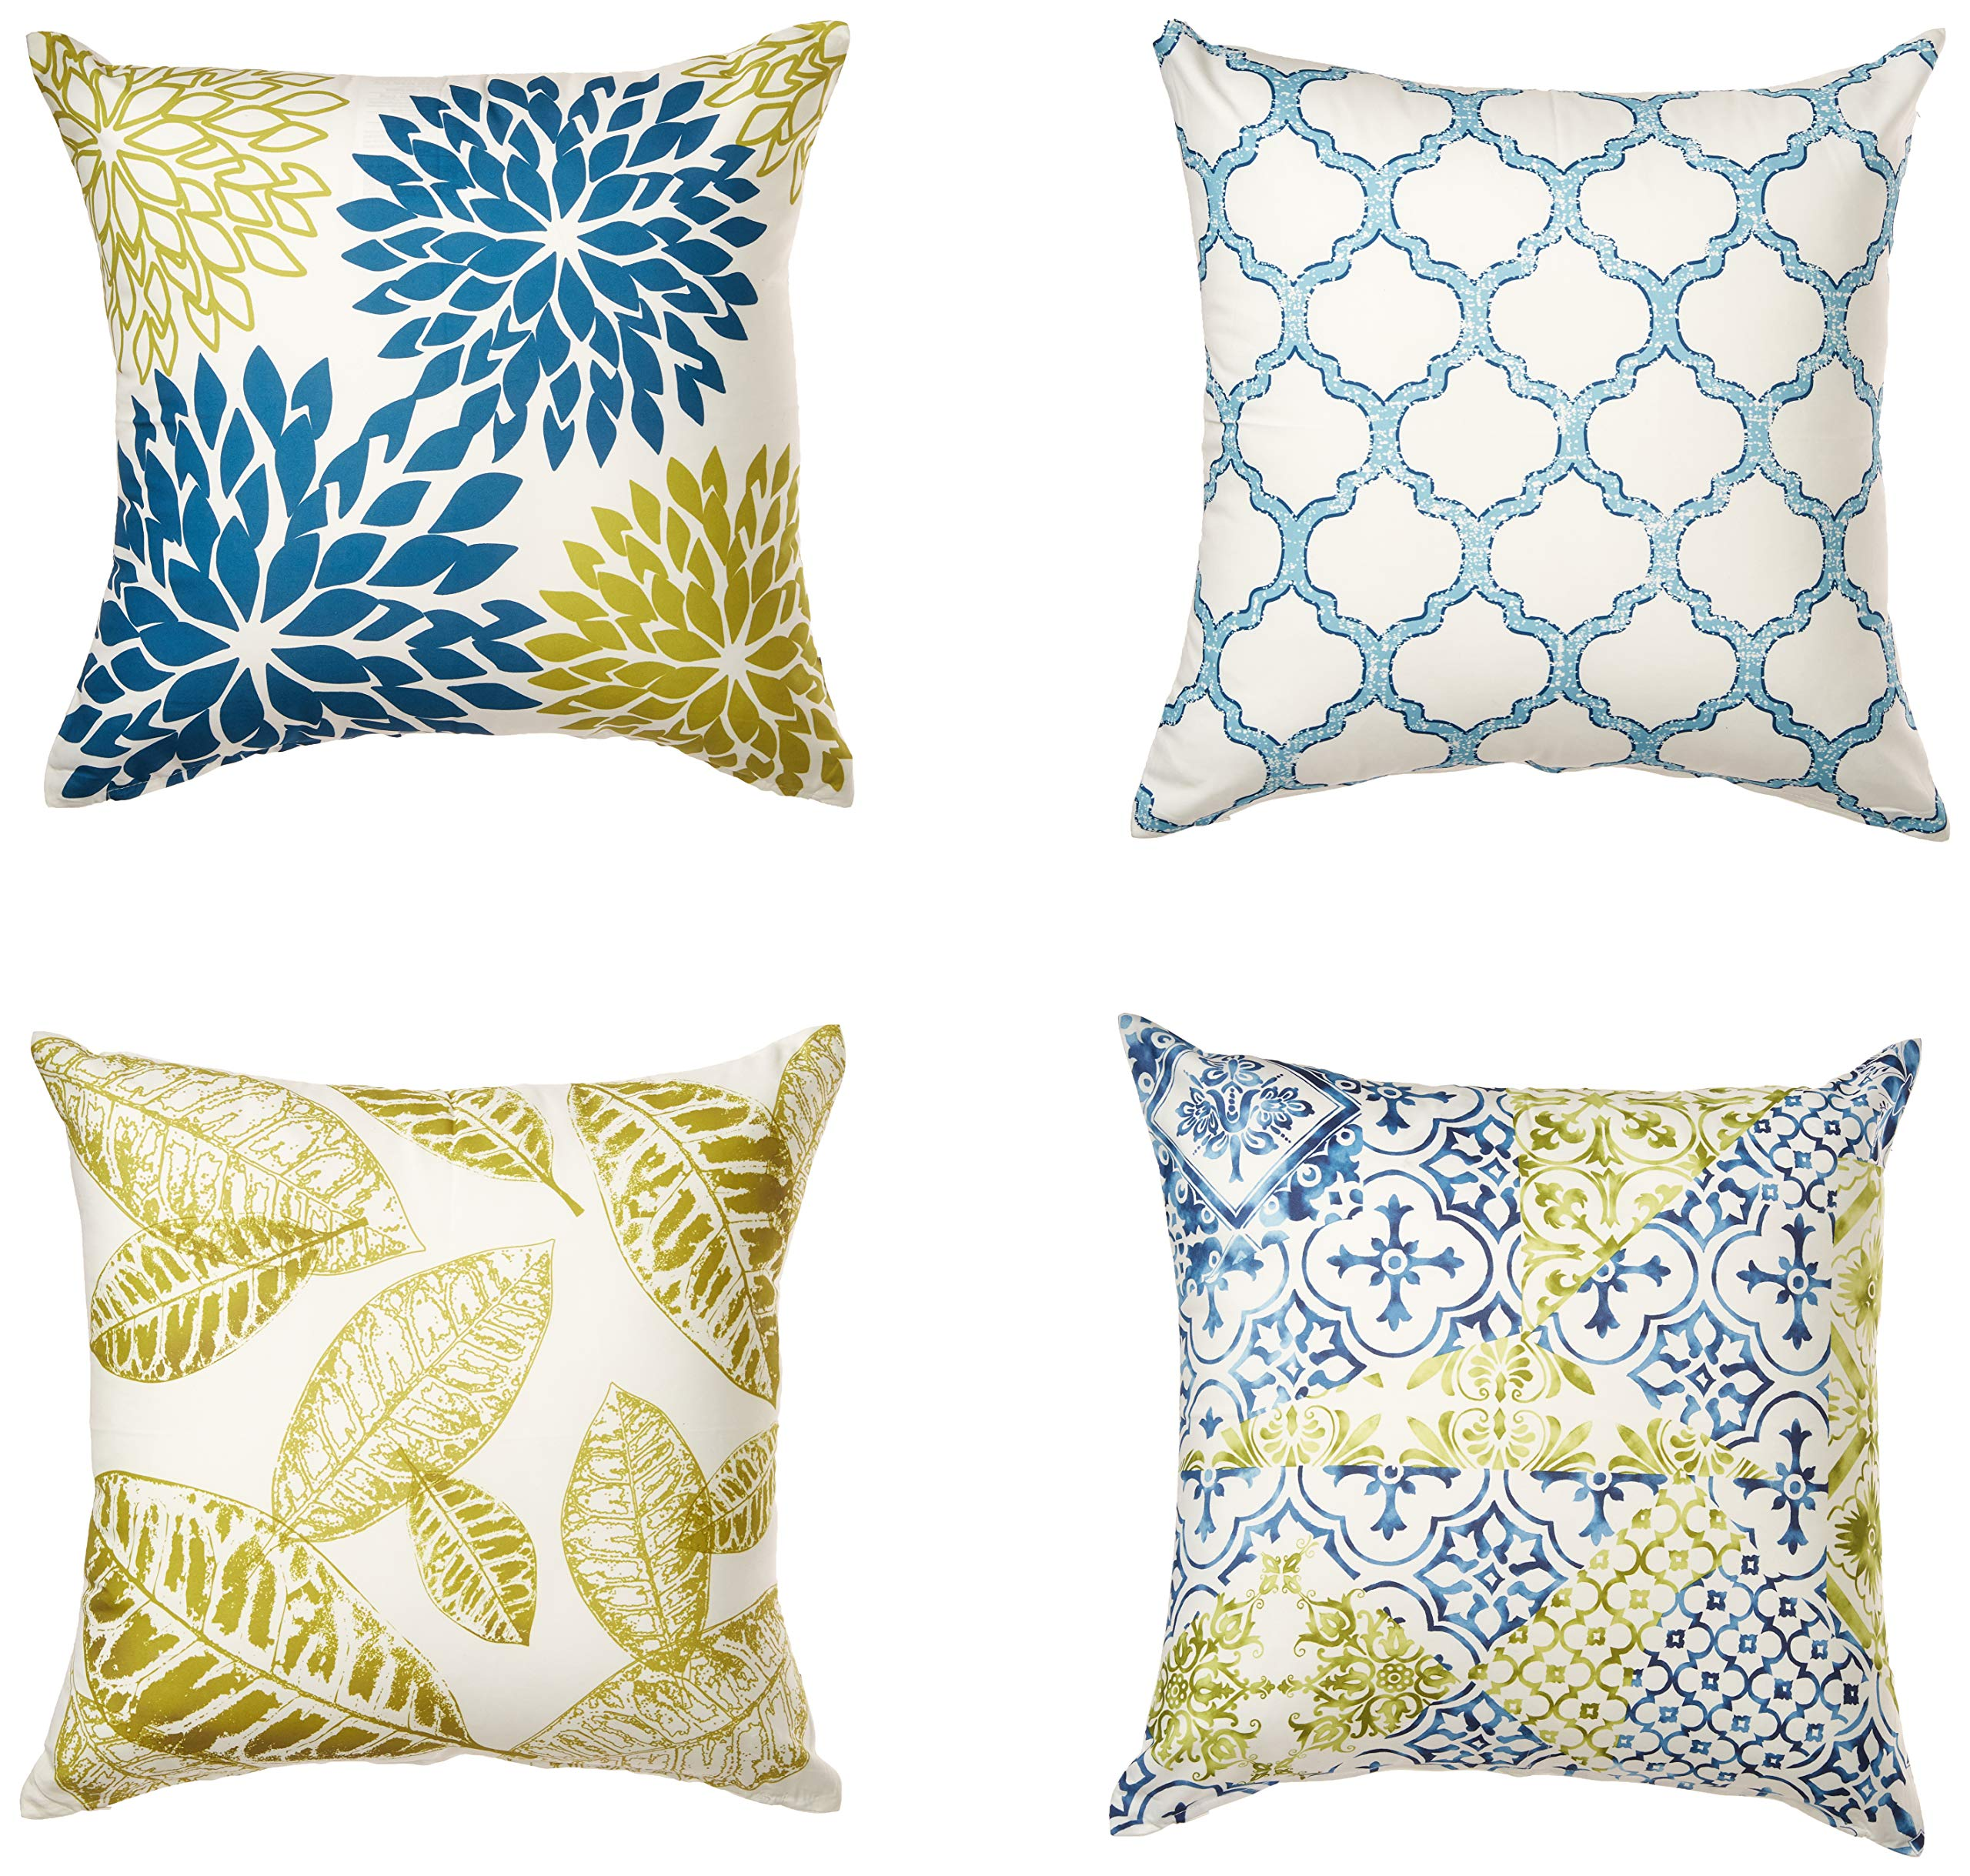 Bags-Online White Stars Decorative in Deep Blue Pillowcase Cushion Cover for Sofa Living Room Almohadillas Decoración del hogar